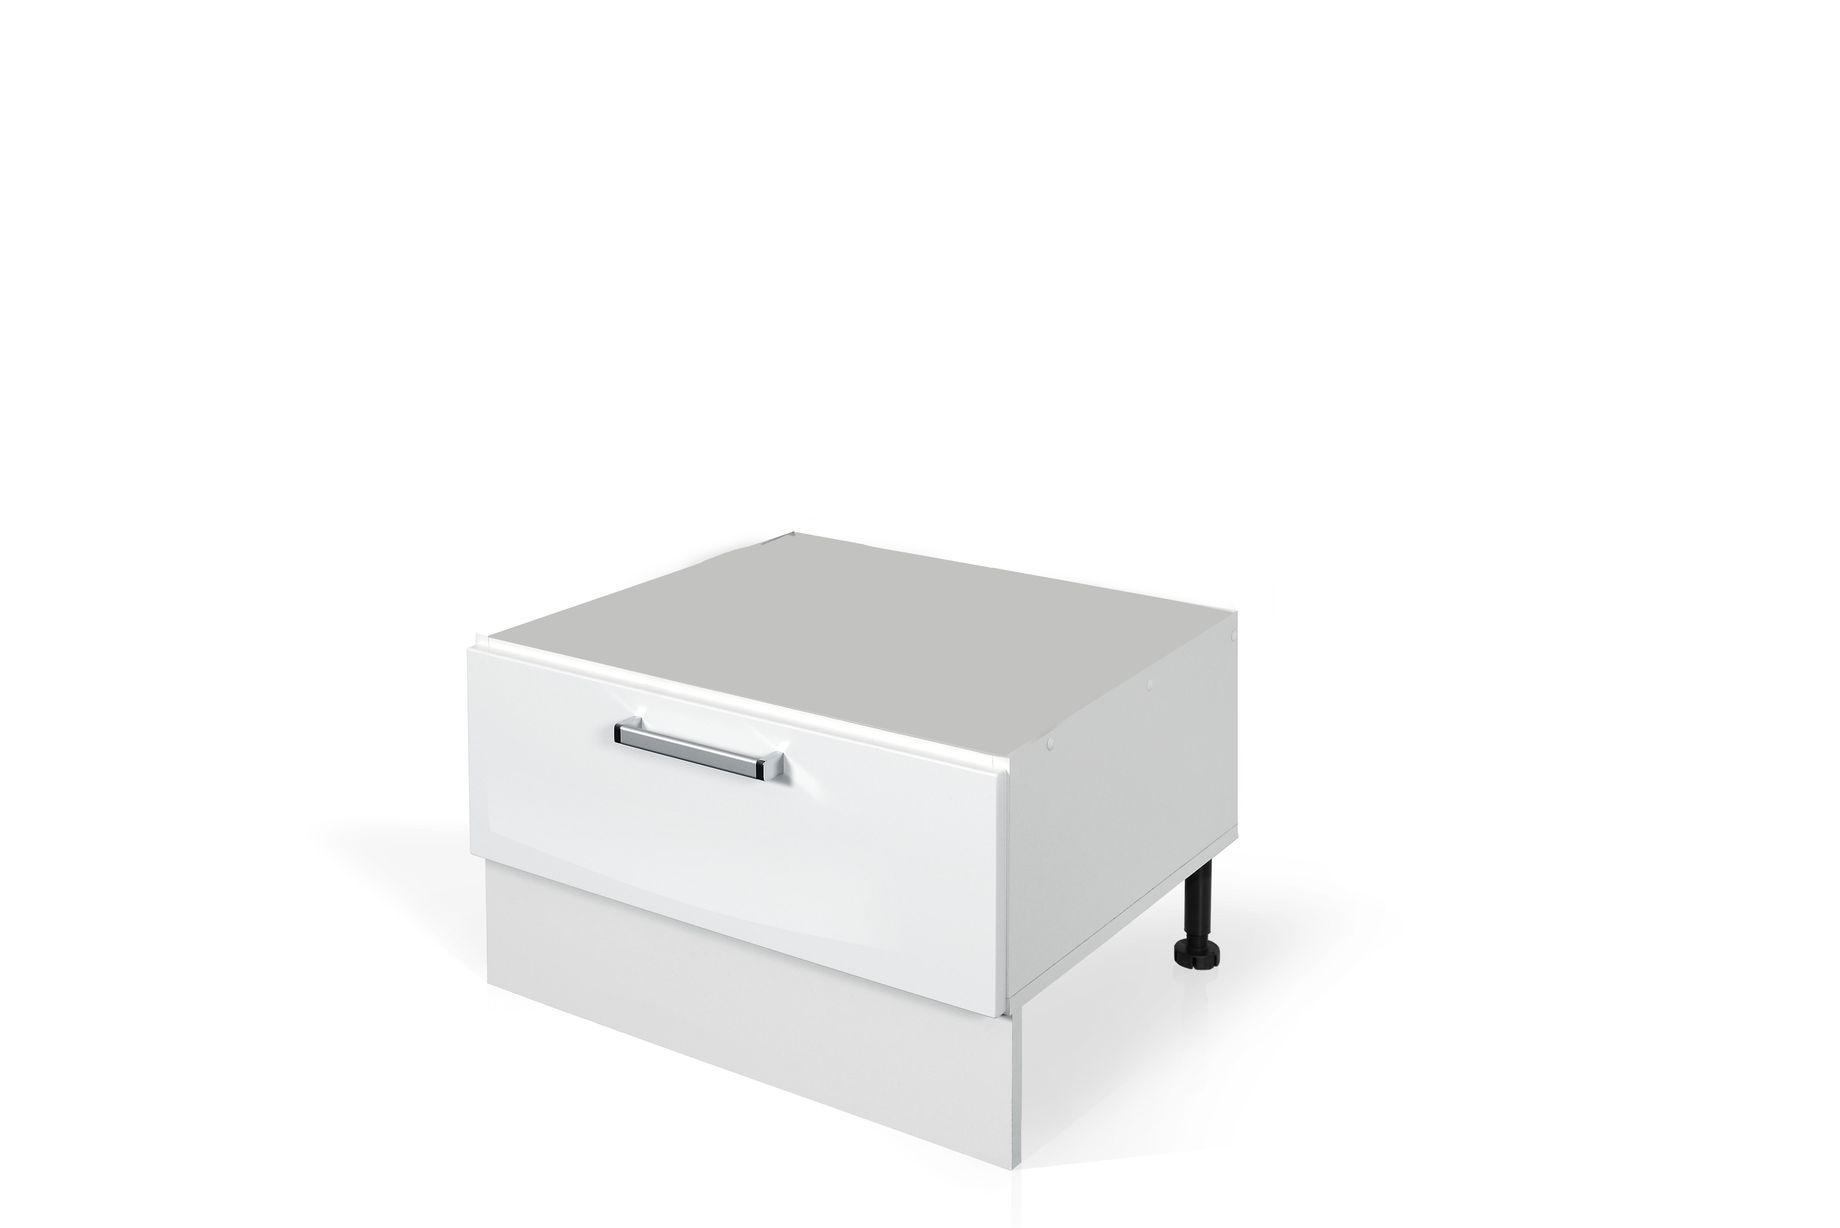 High Gloss White Base dishwasher cabinet S60SZ1-442 for kitchen